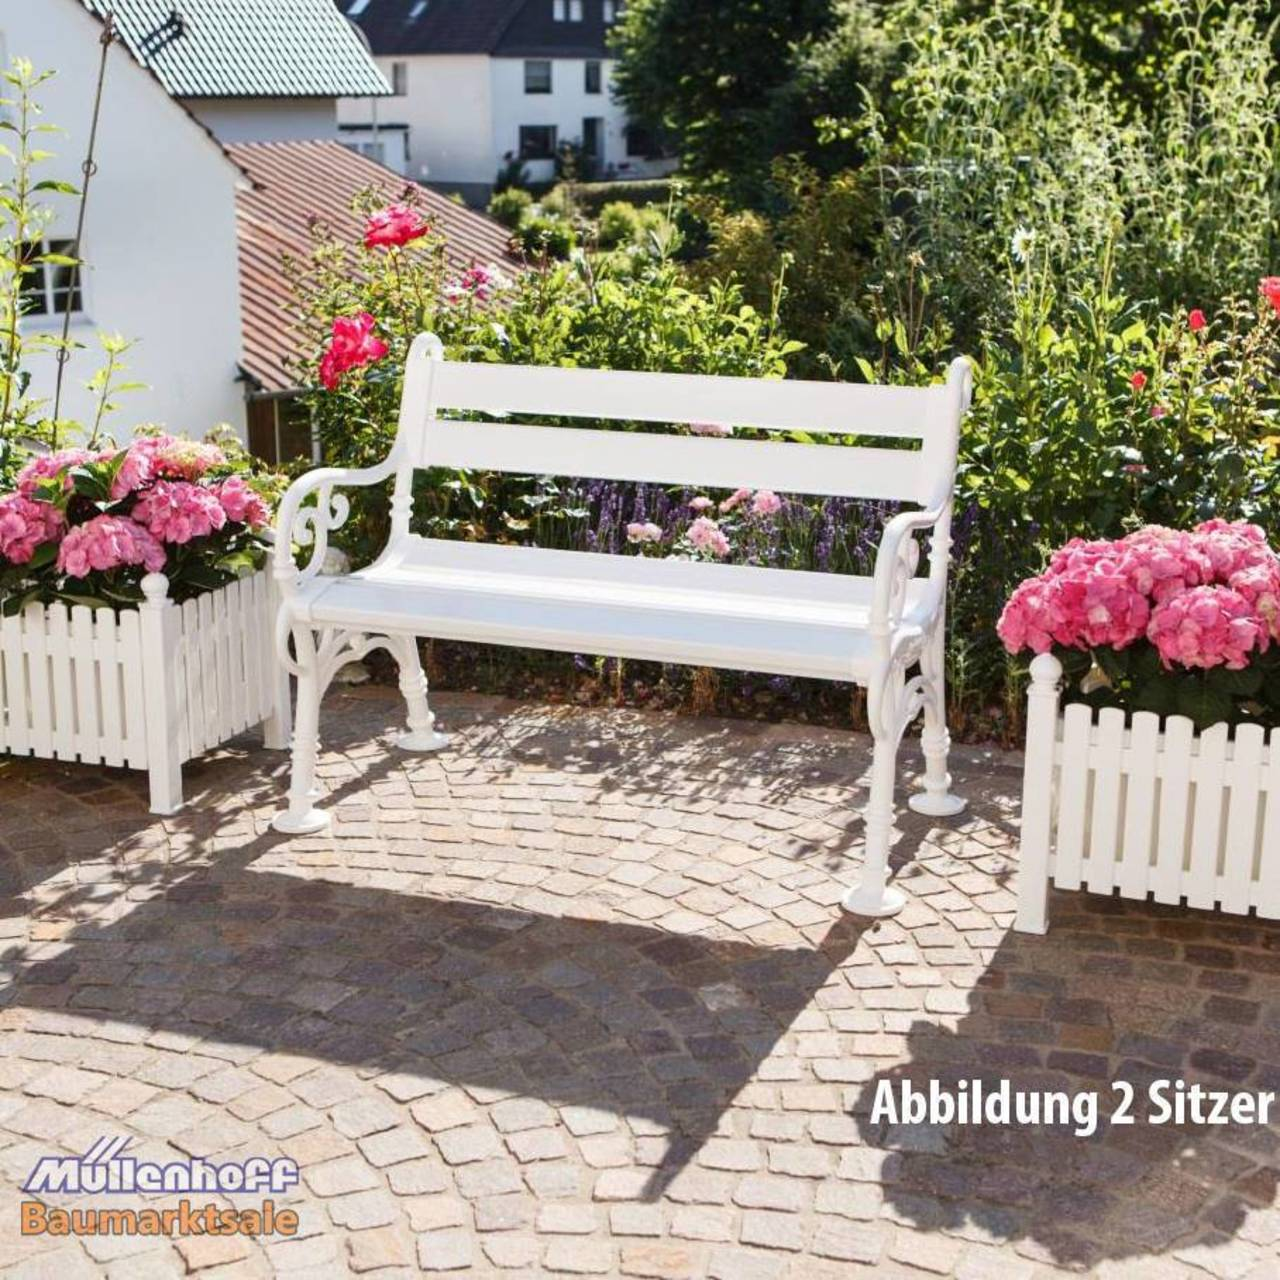 gartenbank landhausbank blome linderhof 2 sitzer wei metall profiltr ger 4007248420016 ebay. Black Bedroom Furniture Sets. Home Design Ideas